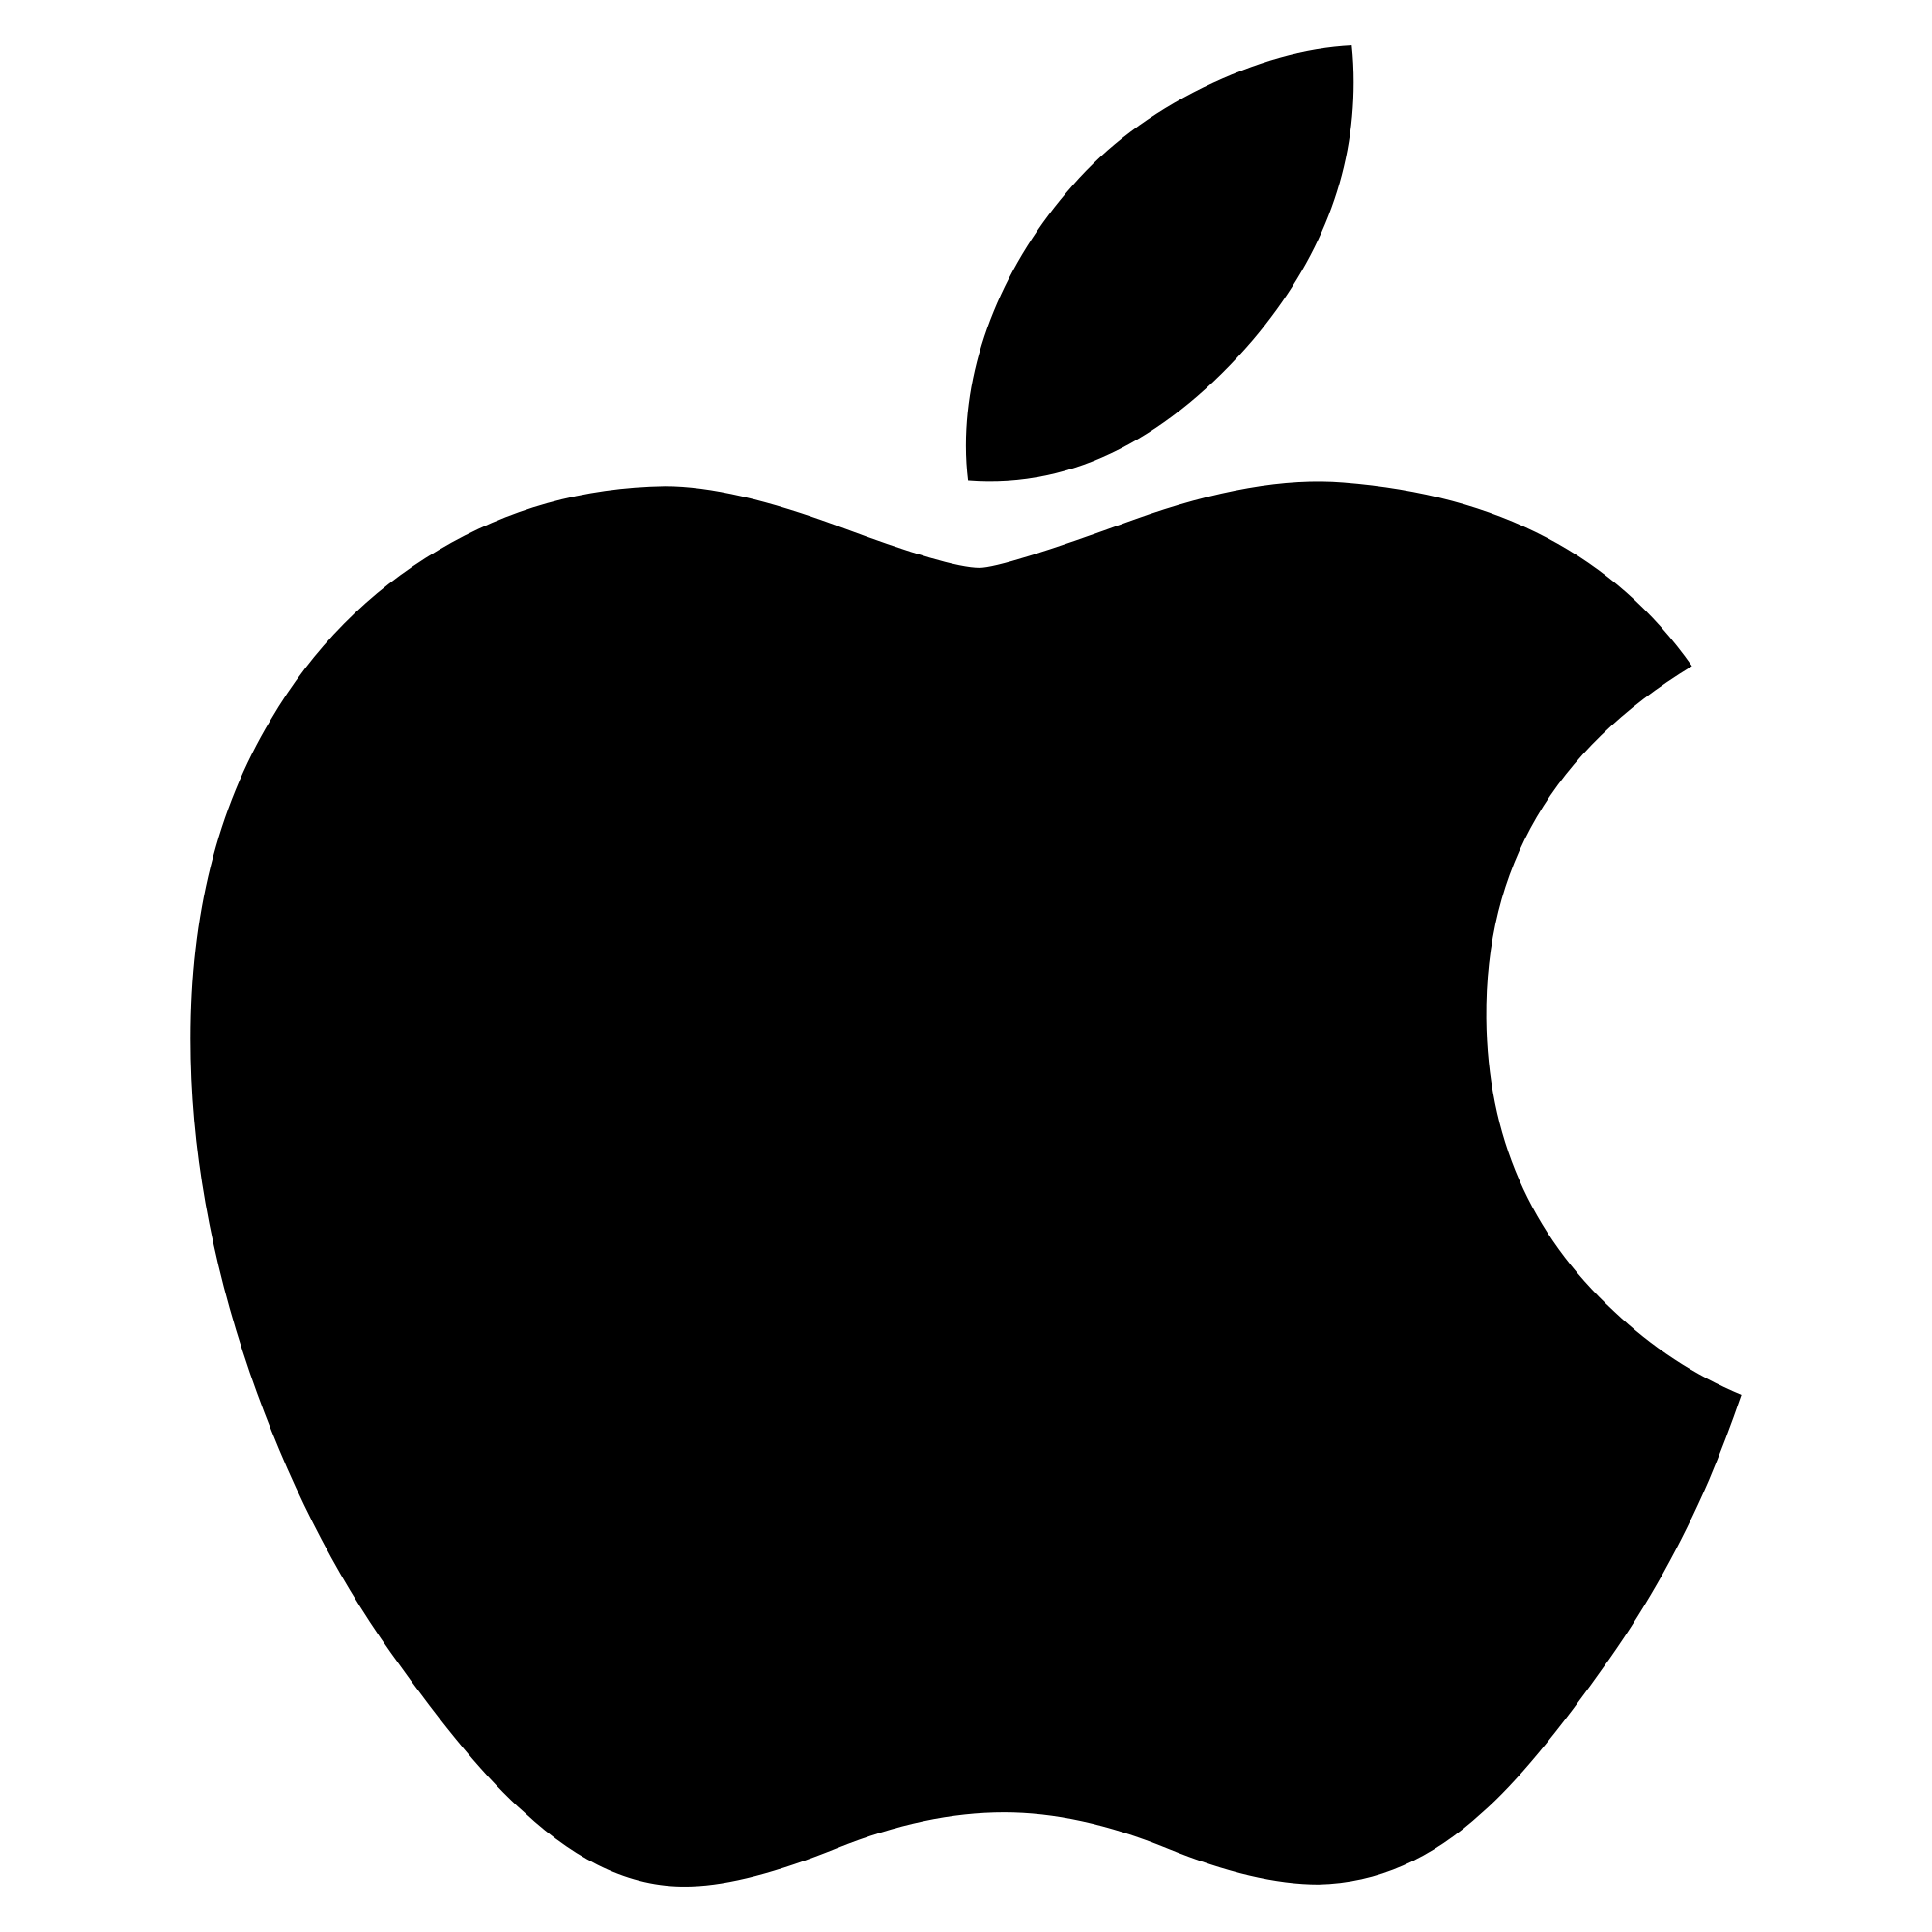 Example: Apple Logo